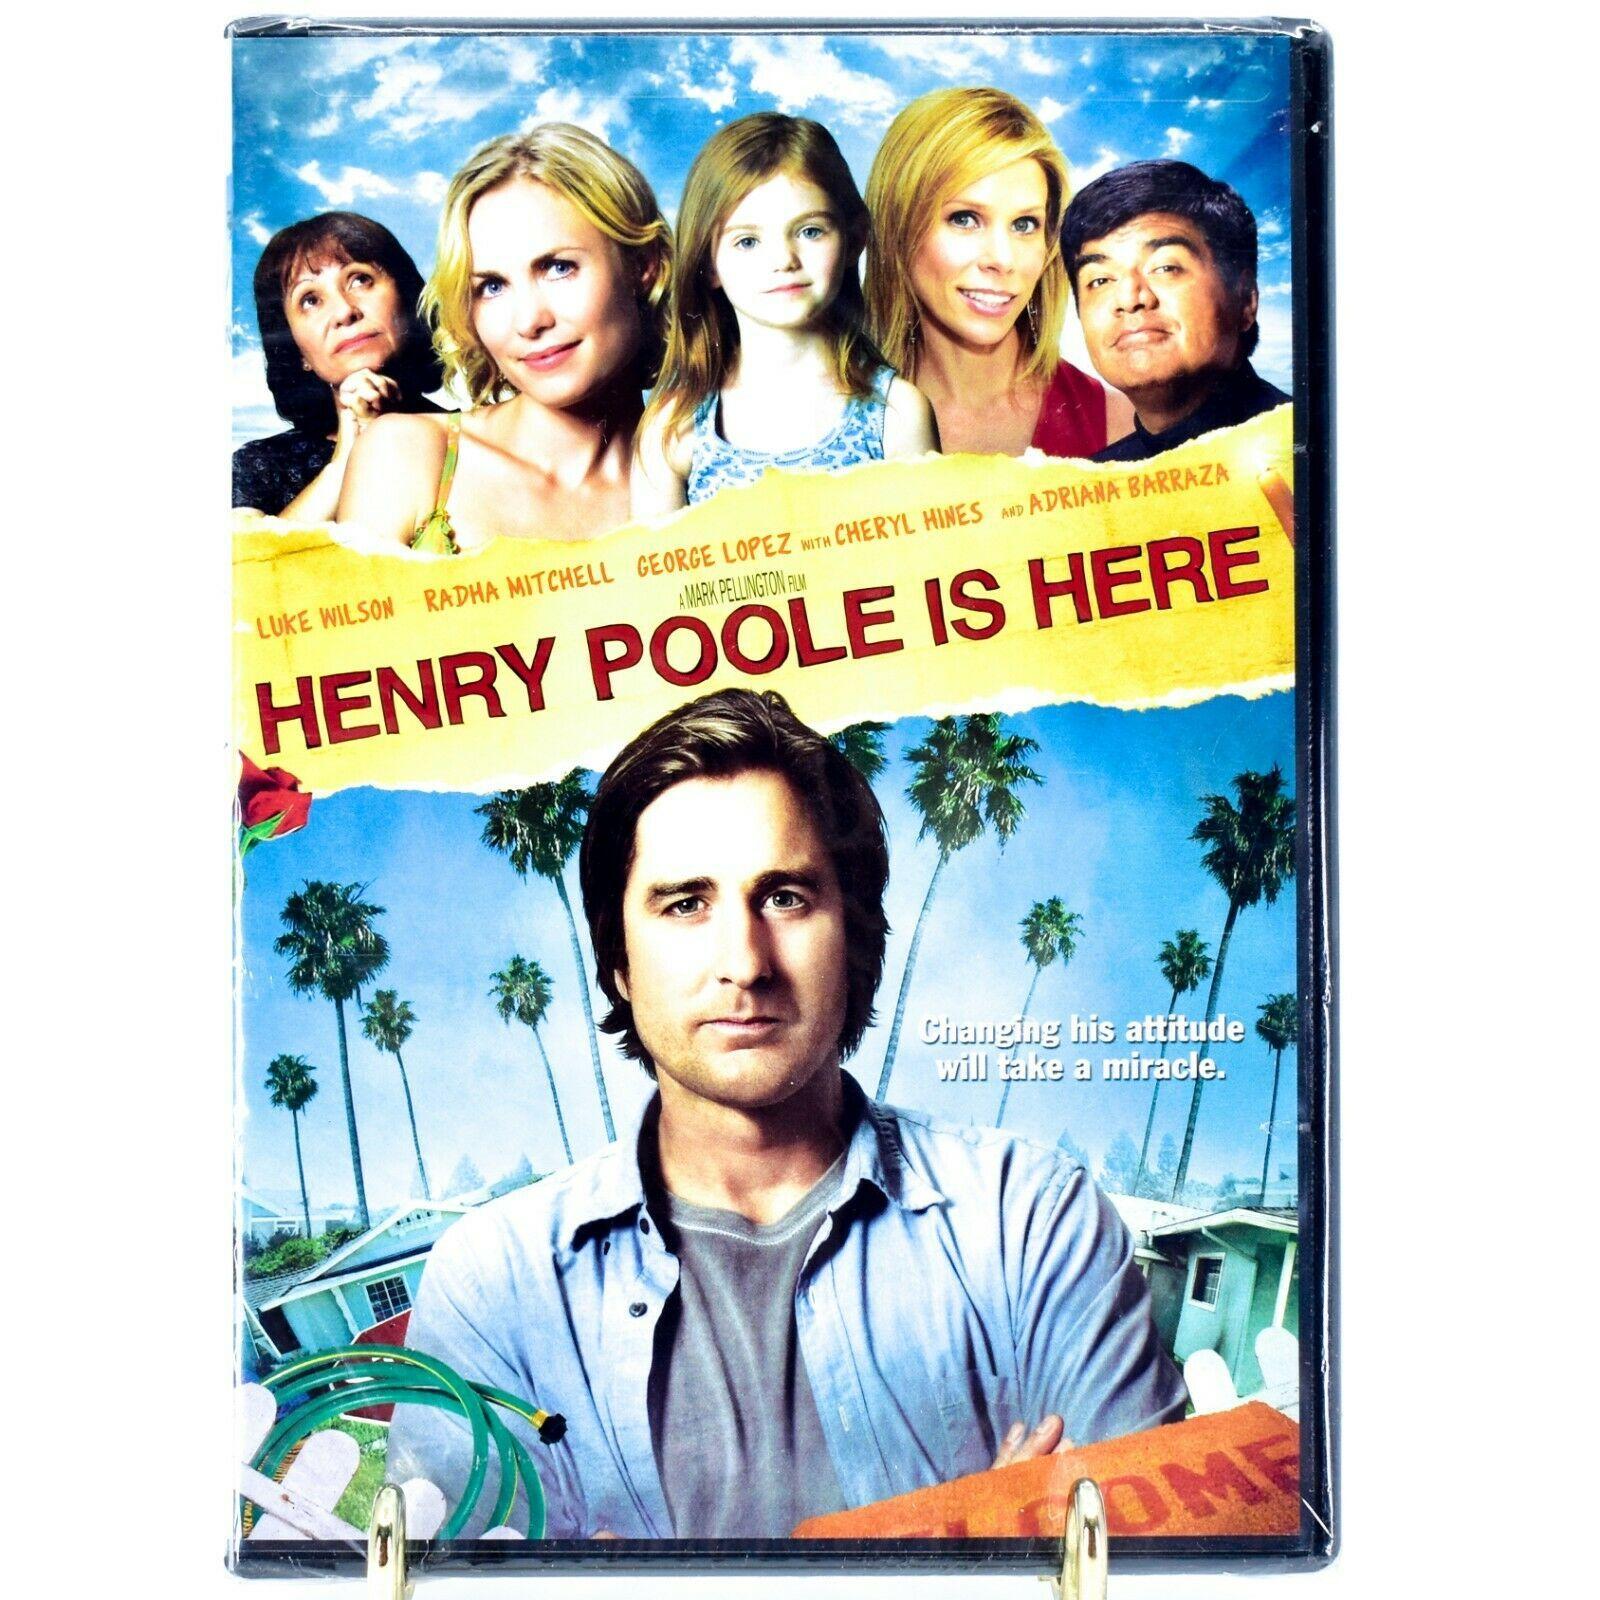 Henry Poole is Here DVD Video NEW SEALED Luke Wilson George Lopez